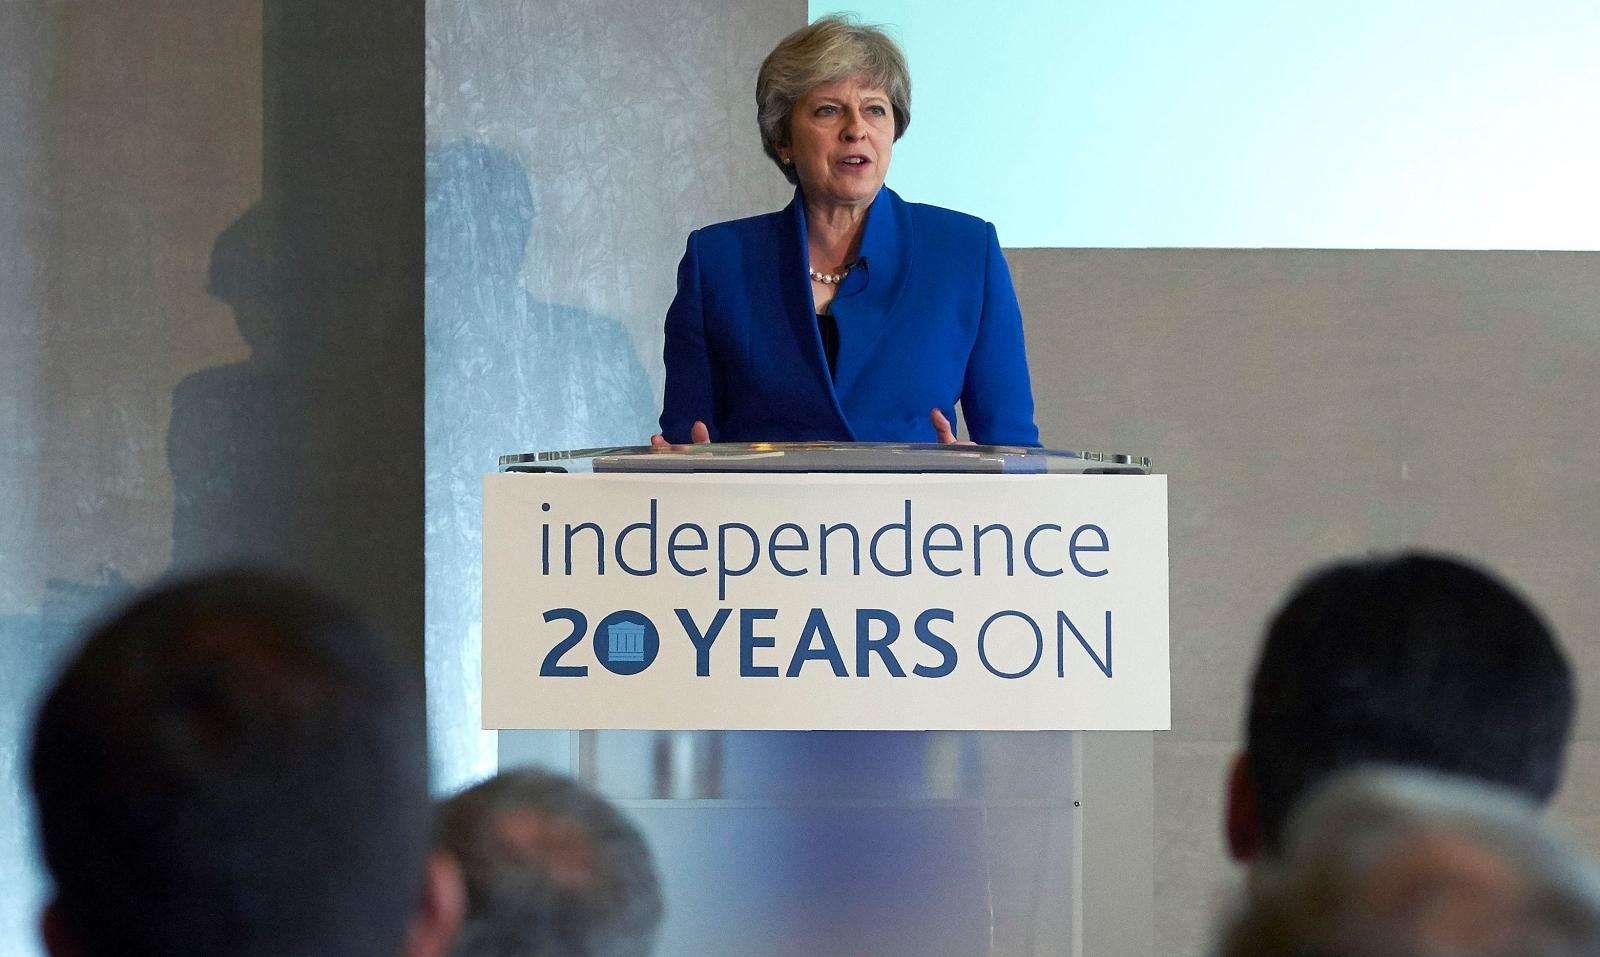 Theresa May Bank of England